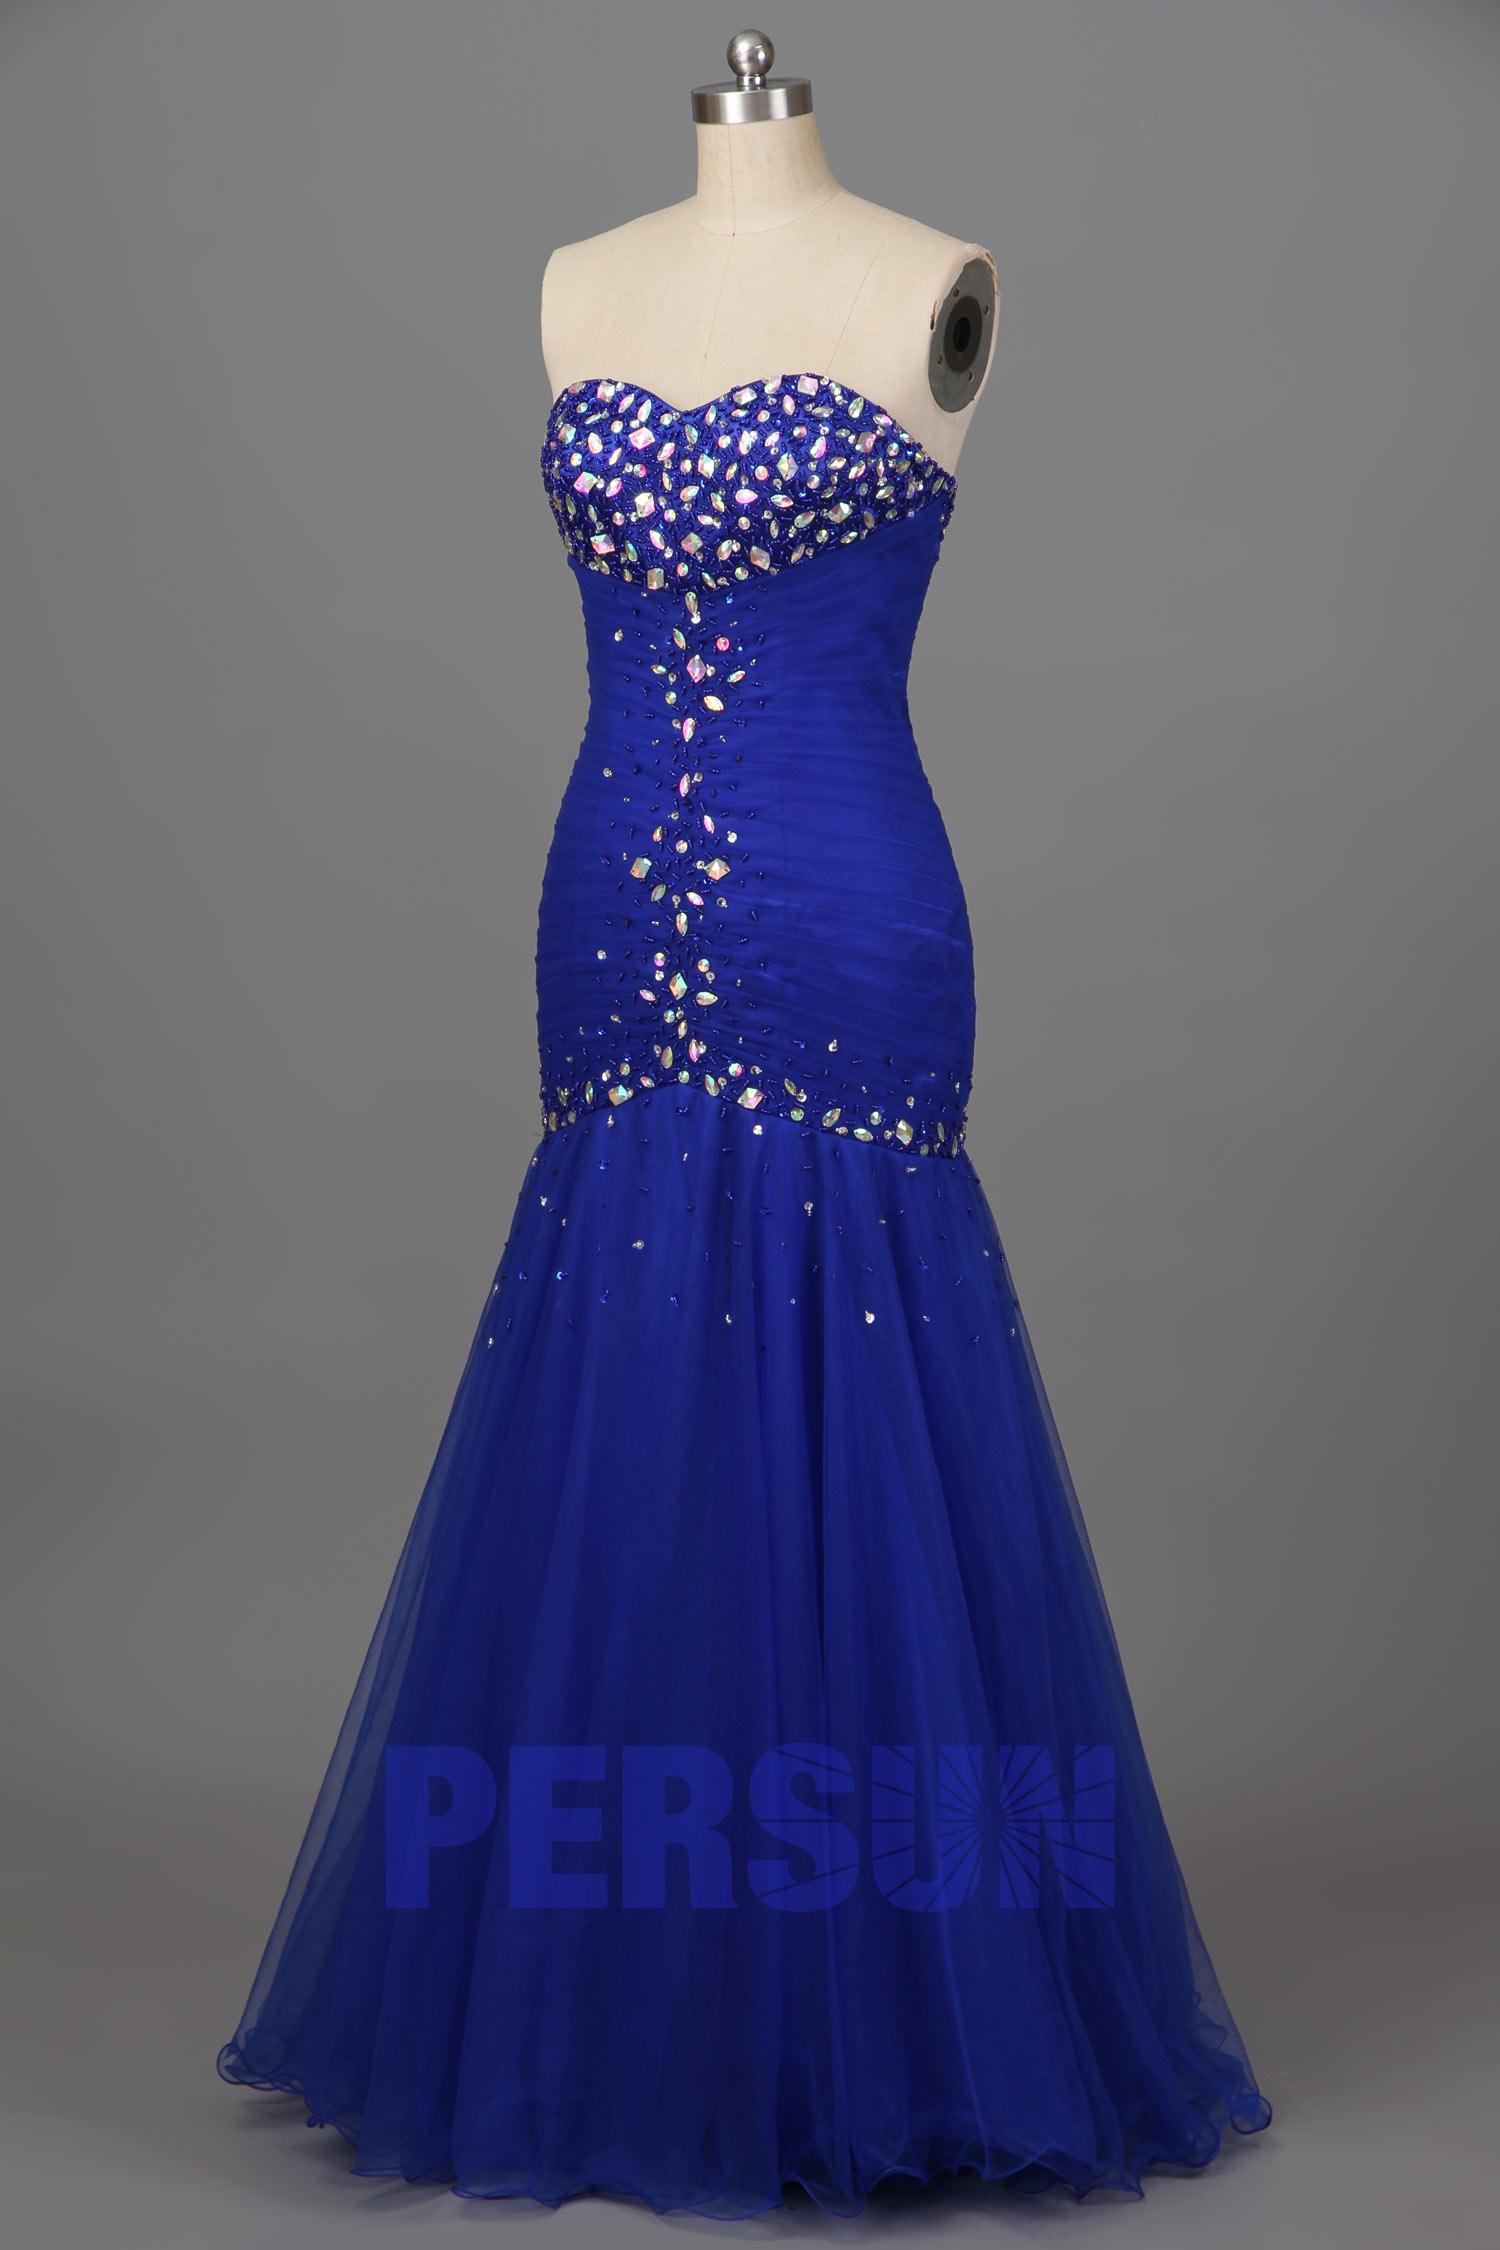 robe de soirée sirène bleu roi bustier coeur embelli de strass ecquis